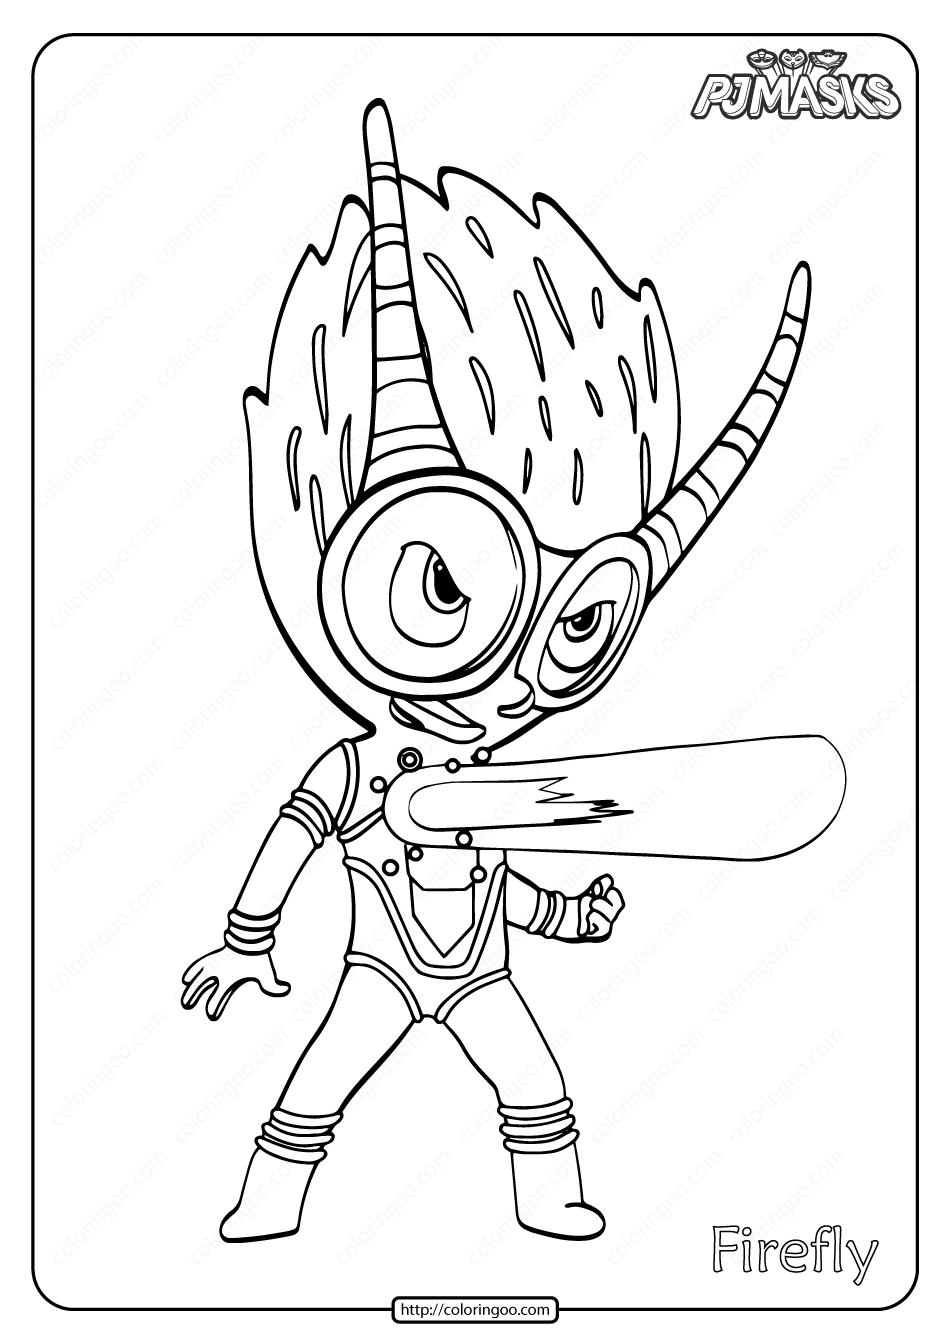 Free Printable PJ Masks Firefly Pdf Coloring Page